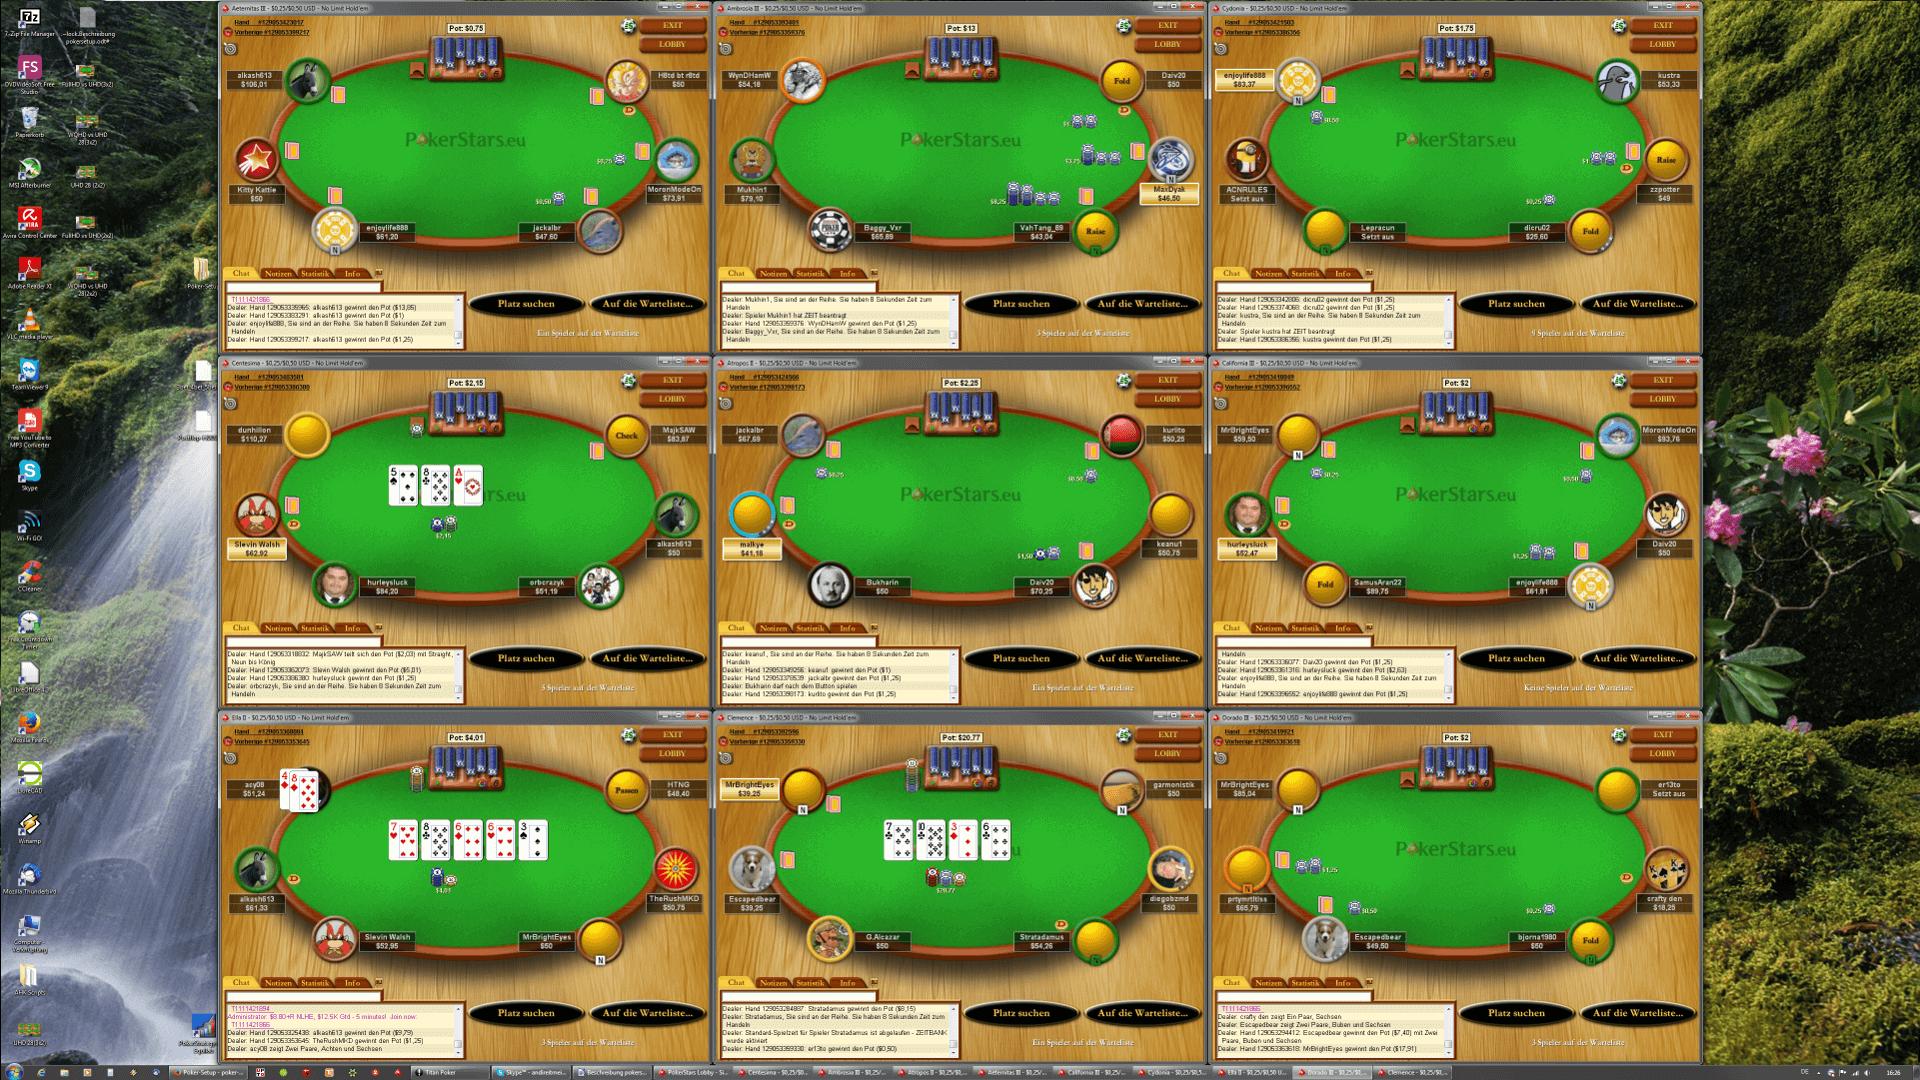 online poker tipps - UHD 28(3x3)